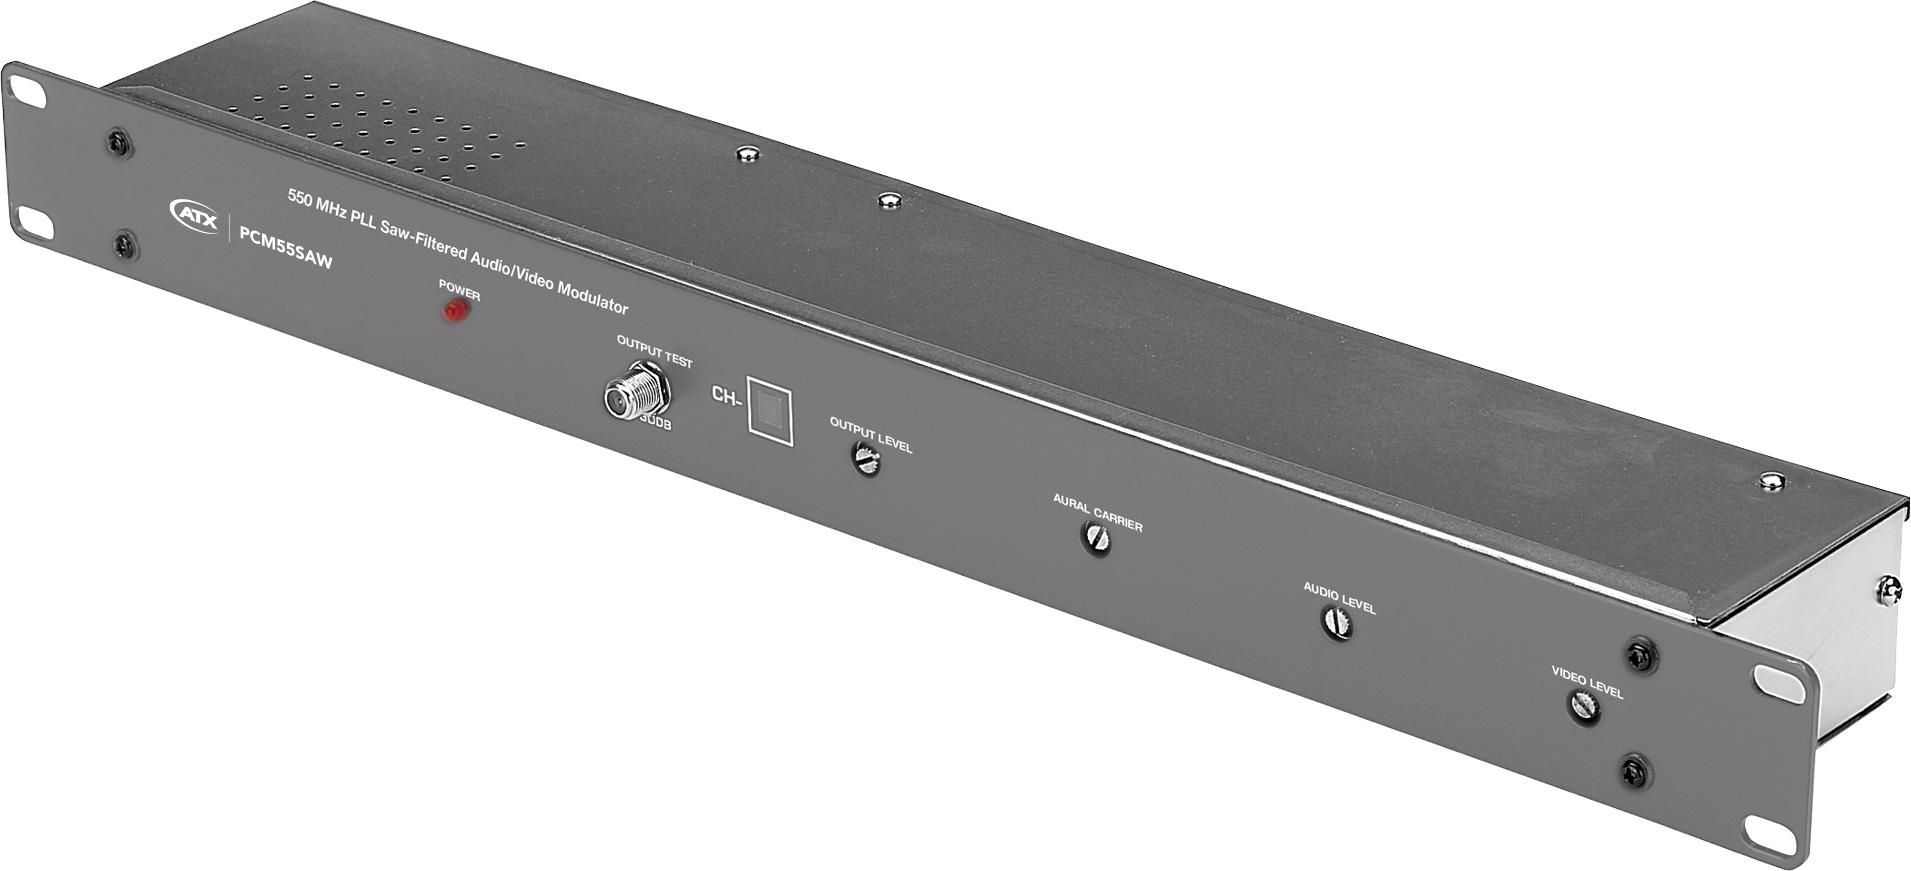 1 Channel Crystal A/V Modulator - Channel D PM-PCM55SAW-D